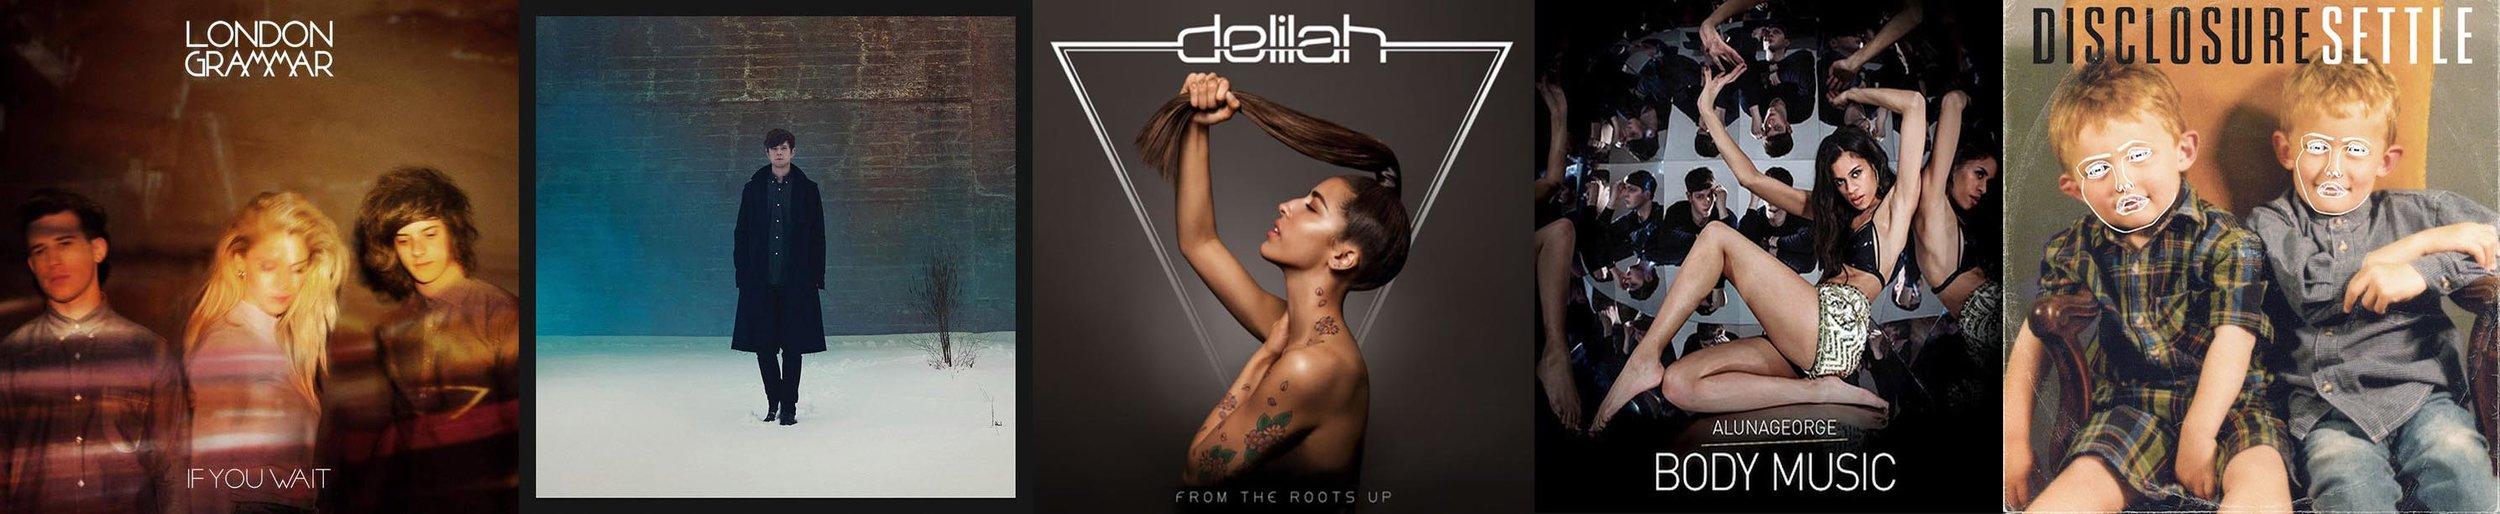 collage-musik.jpg